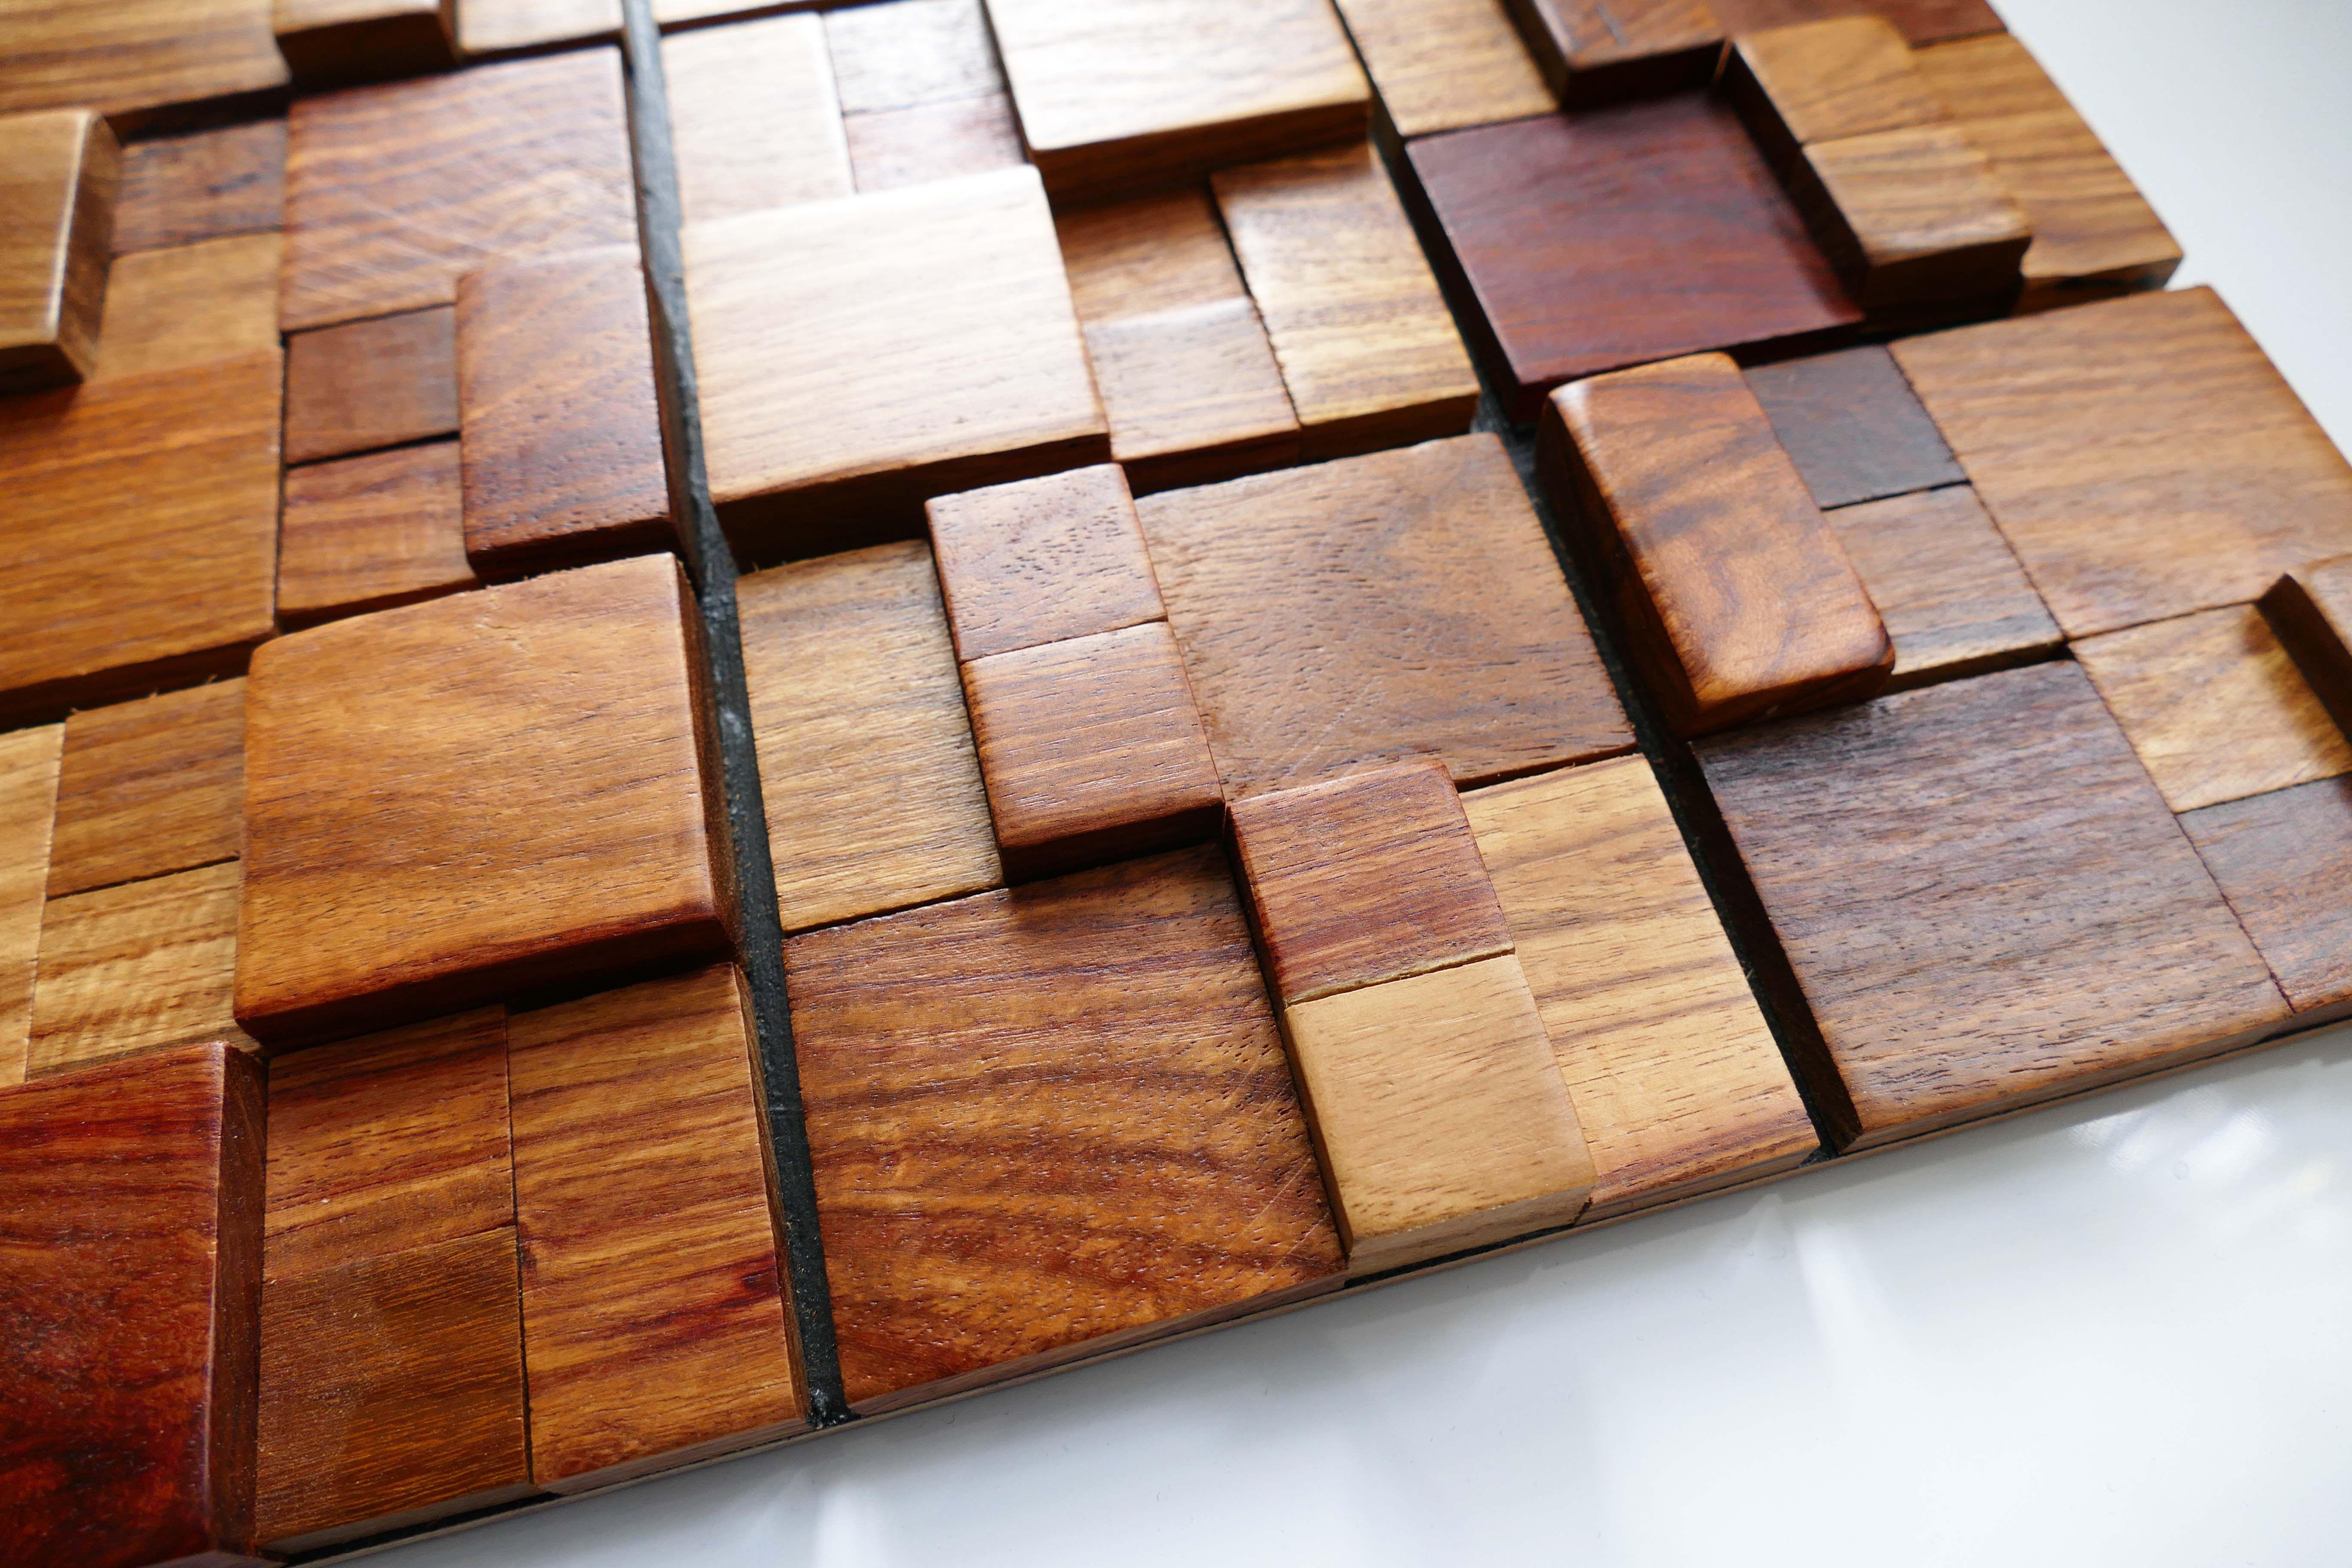 Wall Tiles Wall Decor Mosaic Tiles Reclaimed Wood Tile Decorative Wood Tiles